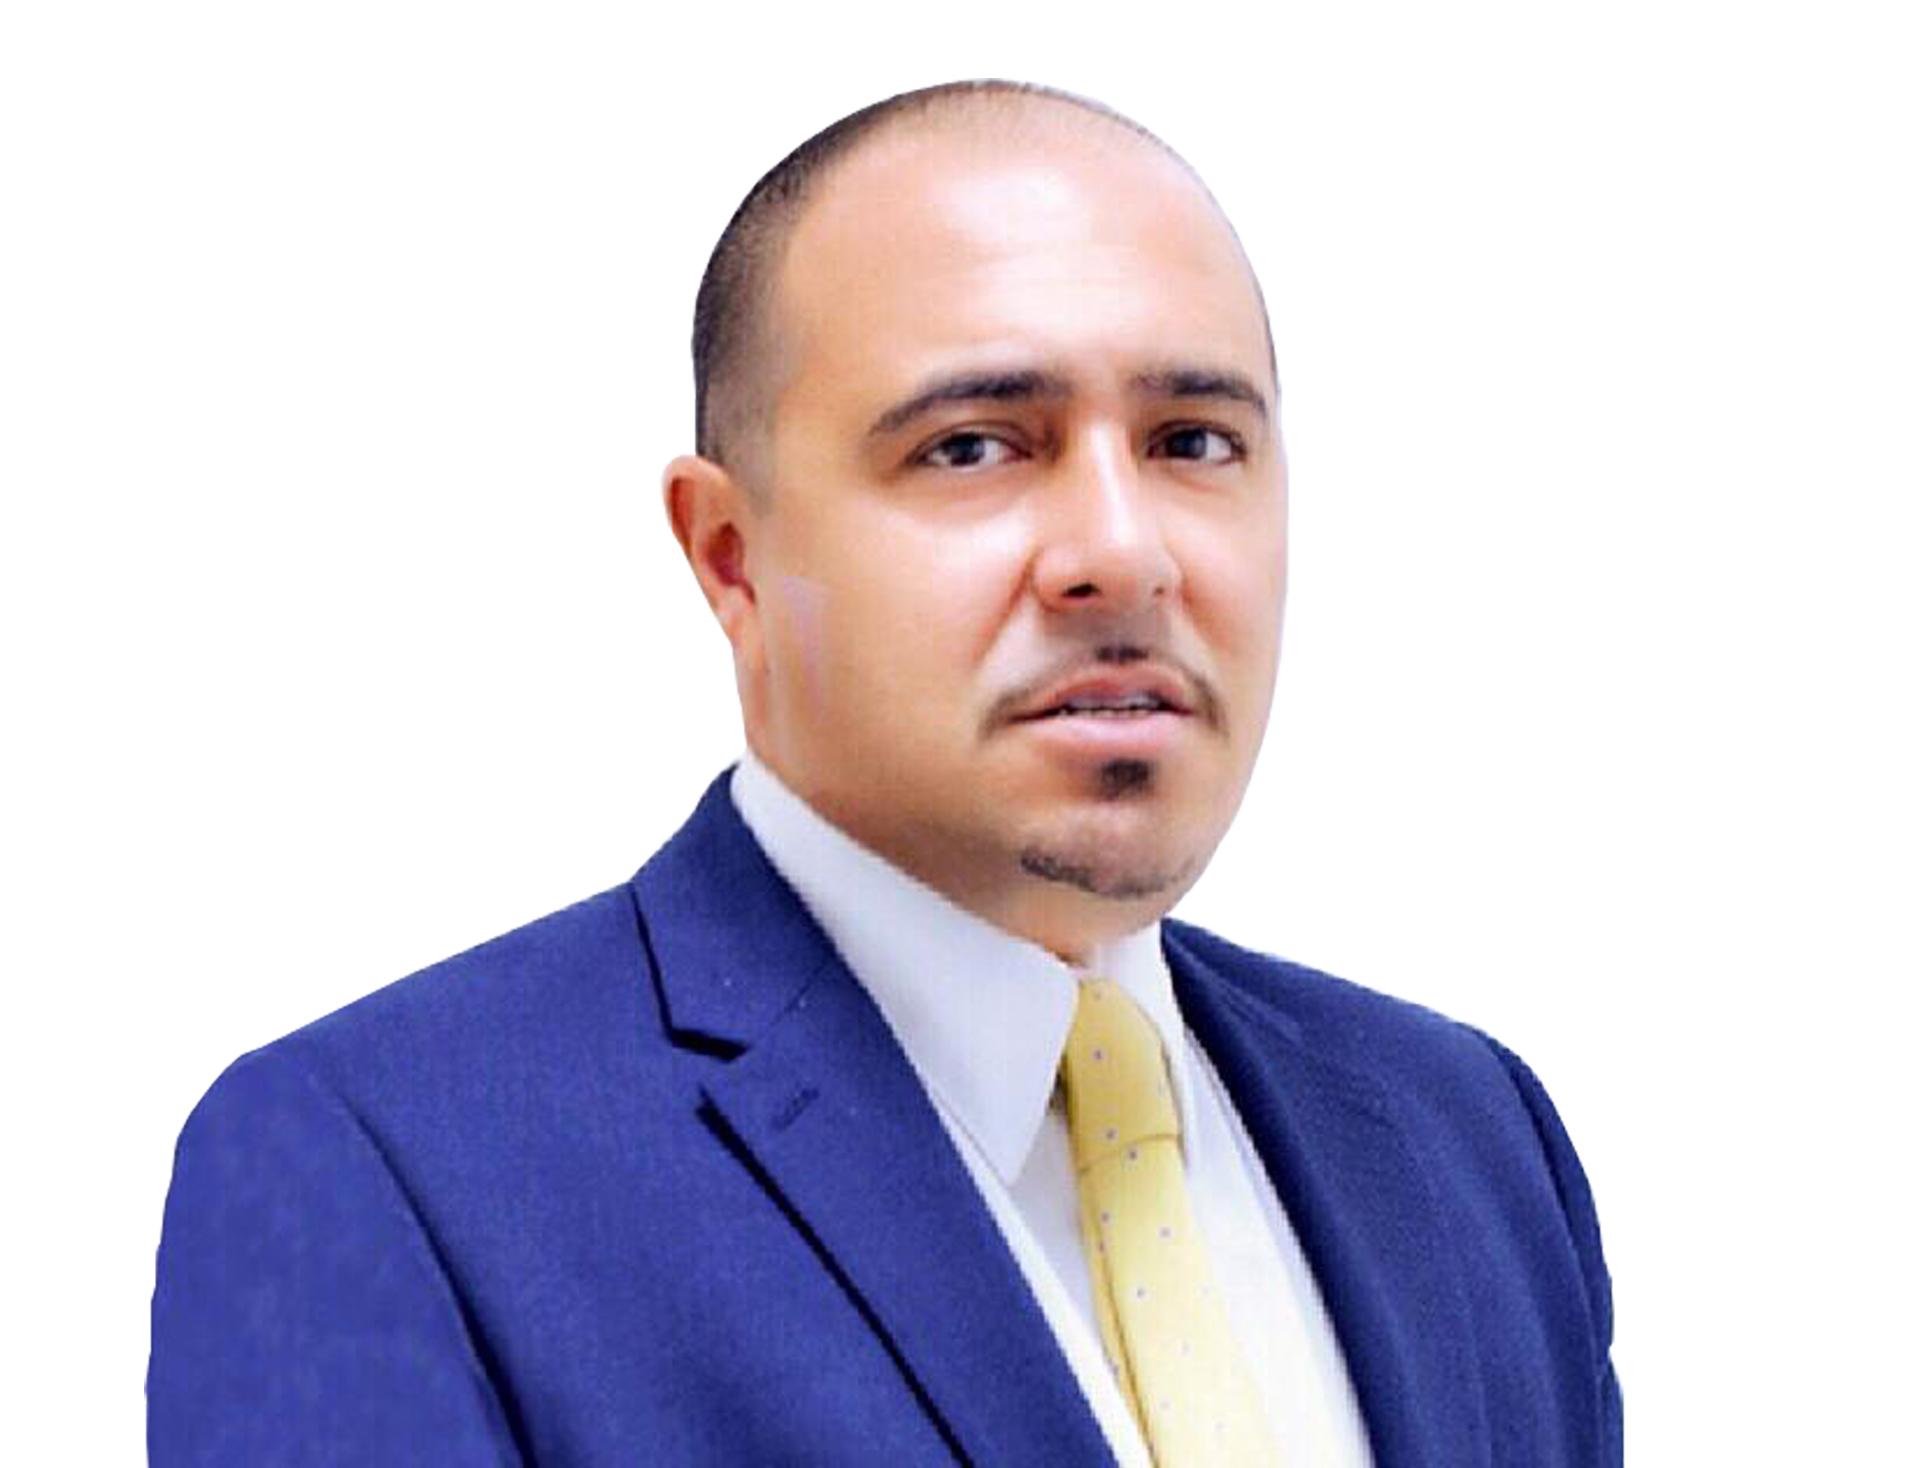 Farhad Alitalab